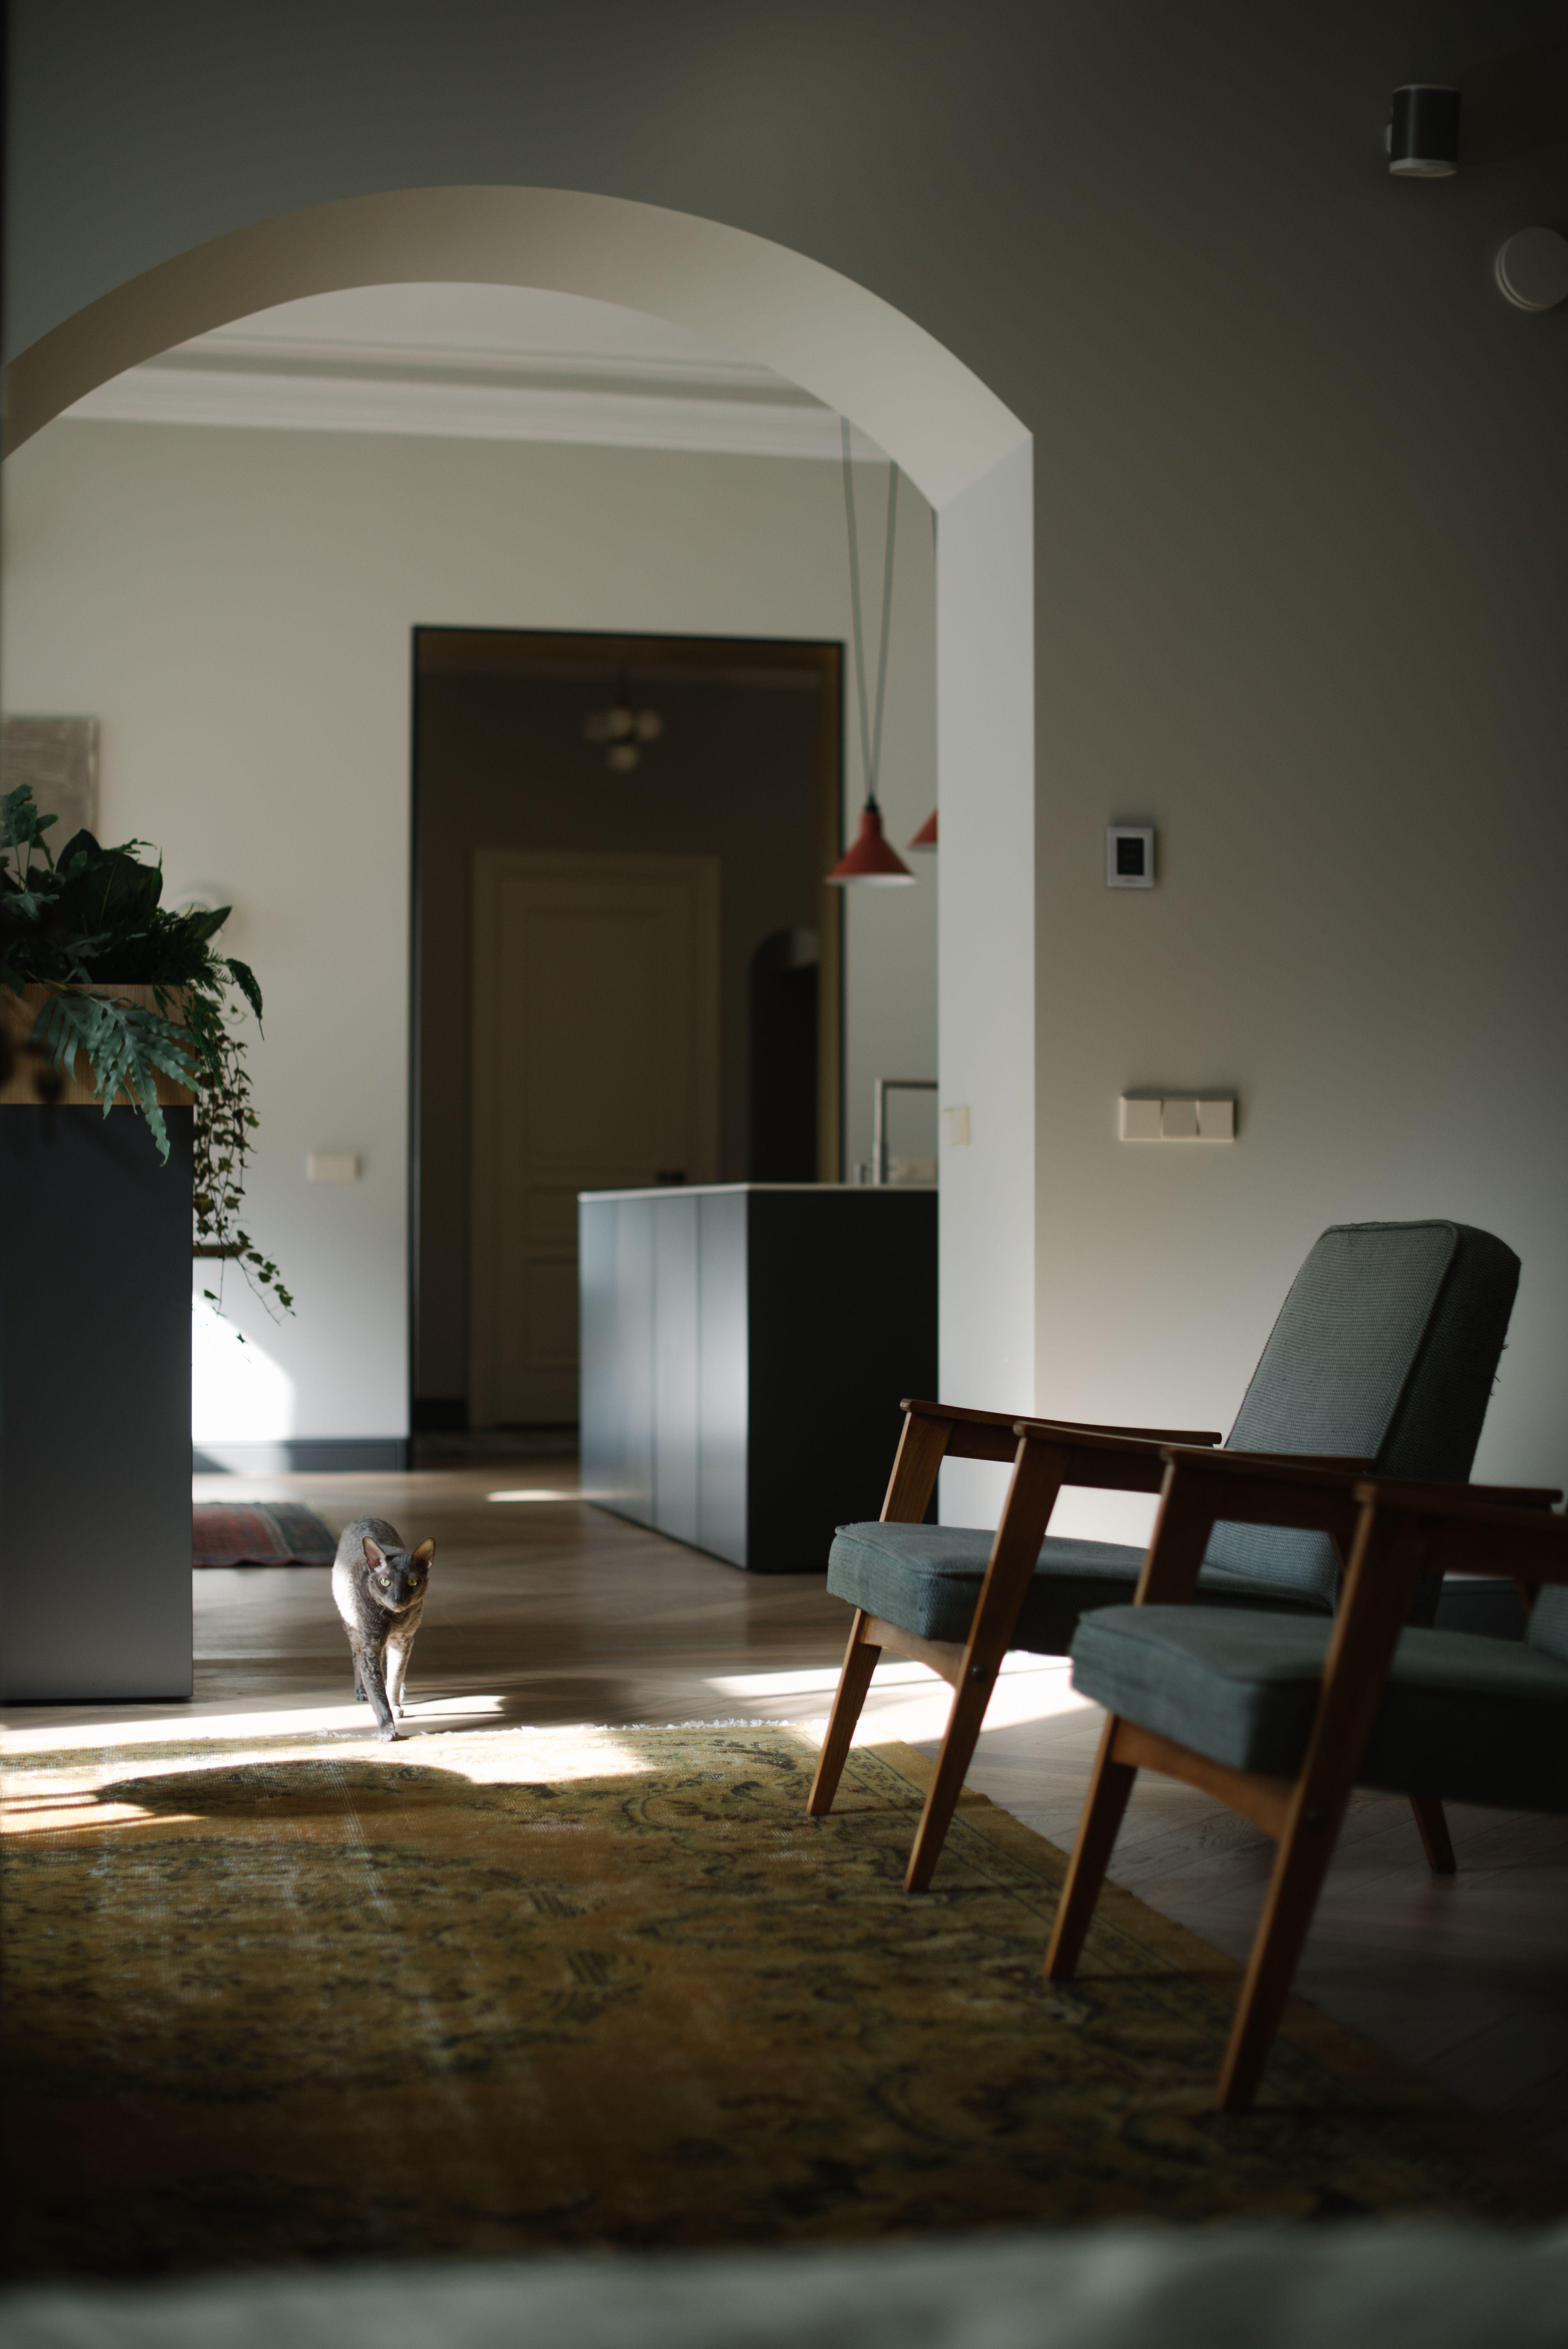 Pin de keemzu en home   Pinterest   Diseño para el hogar, Casas de ...